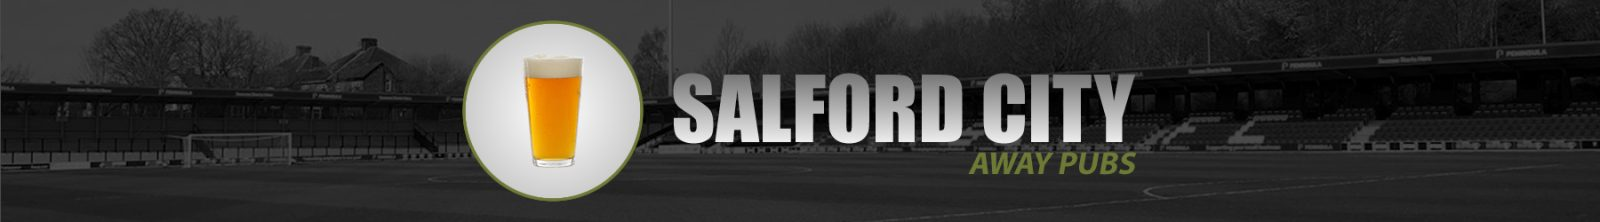 Salford City Away Pubs